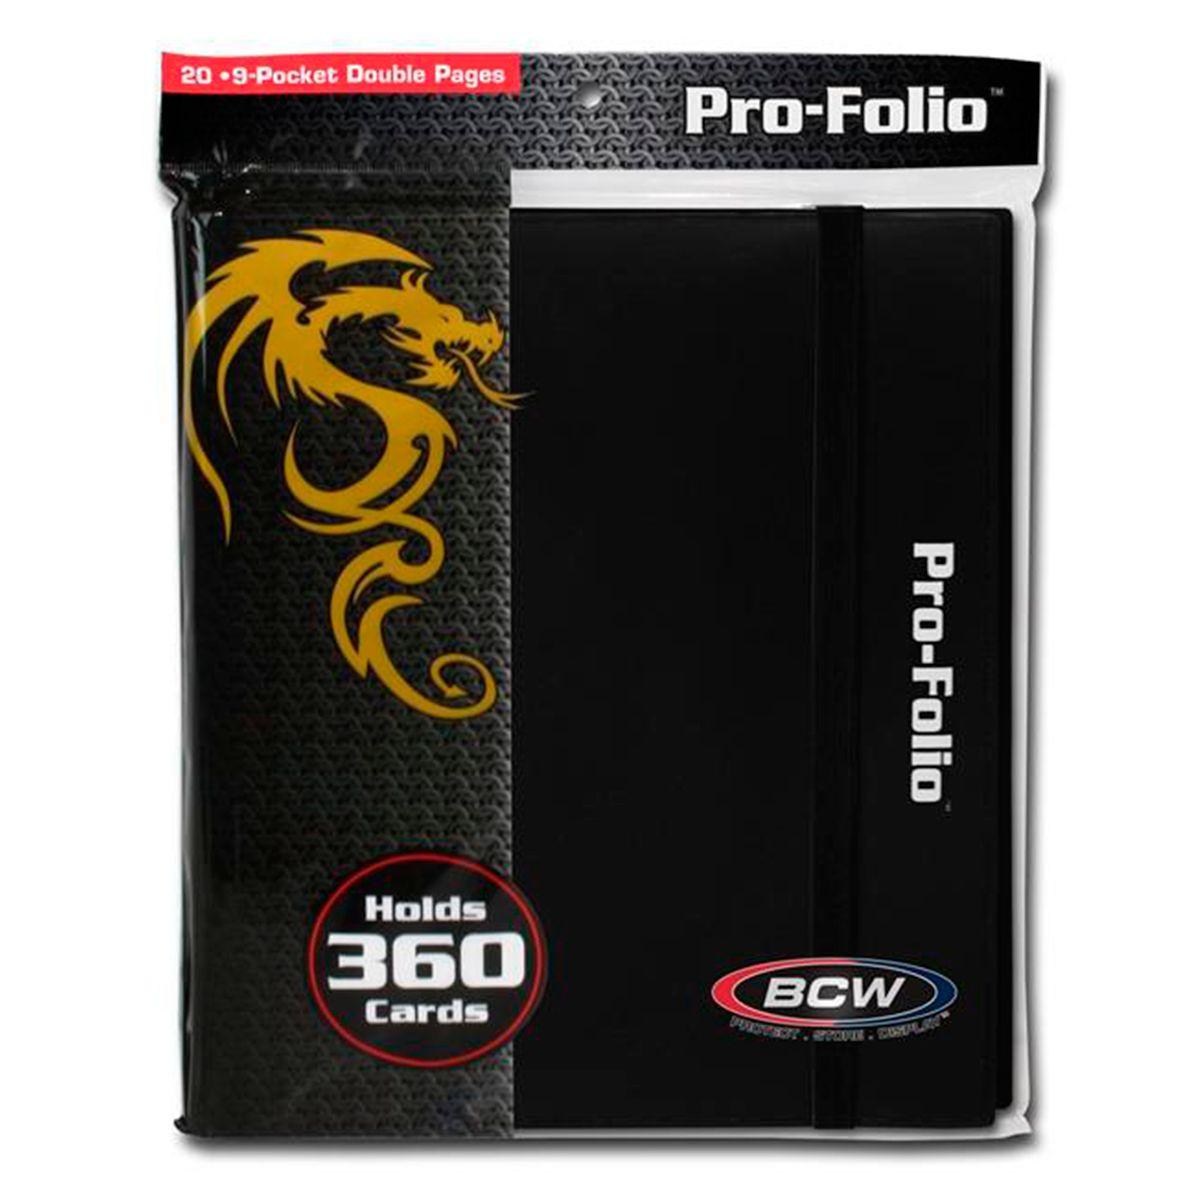 Pasta Pro-Folio BCW 9 Bolsos 20 Folhas duplas - Preto